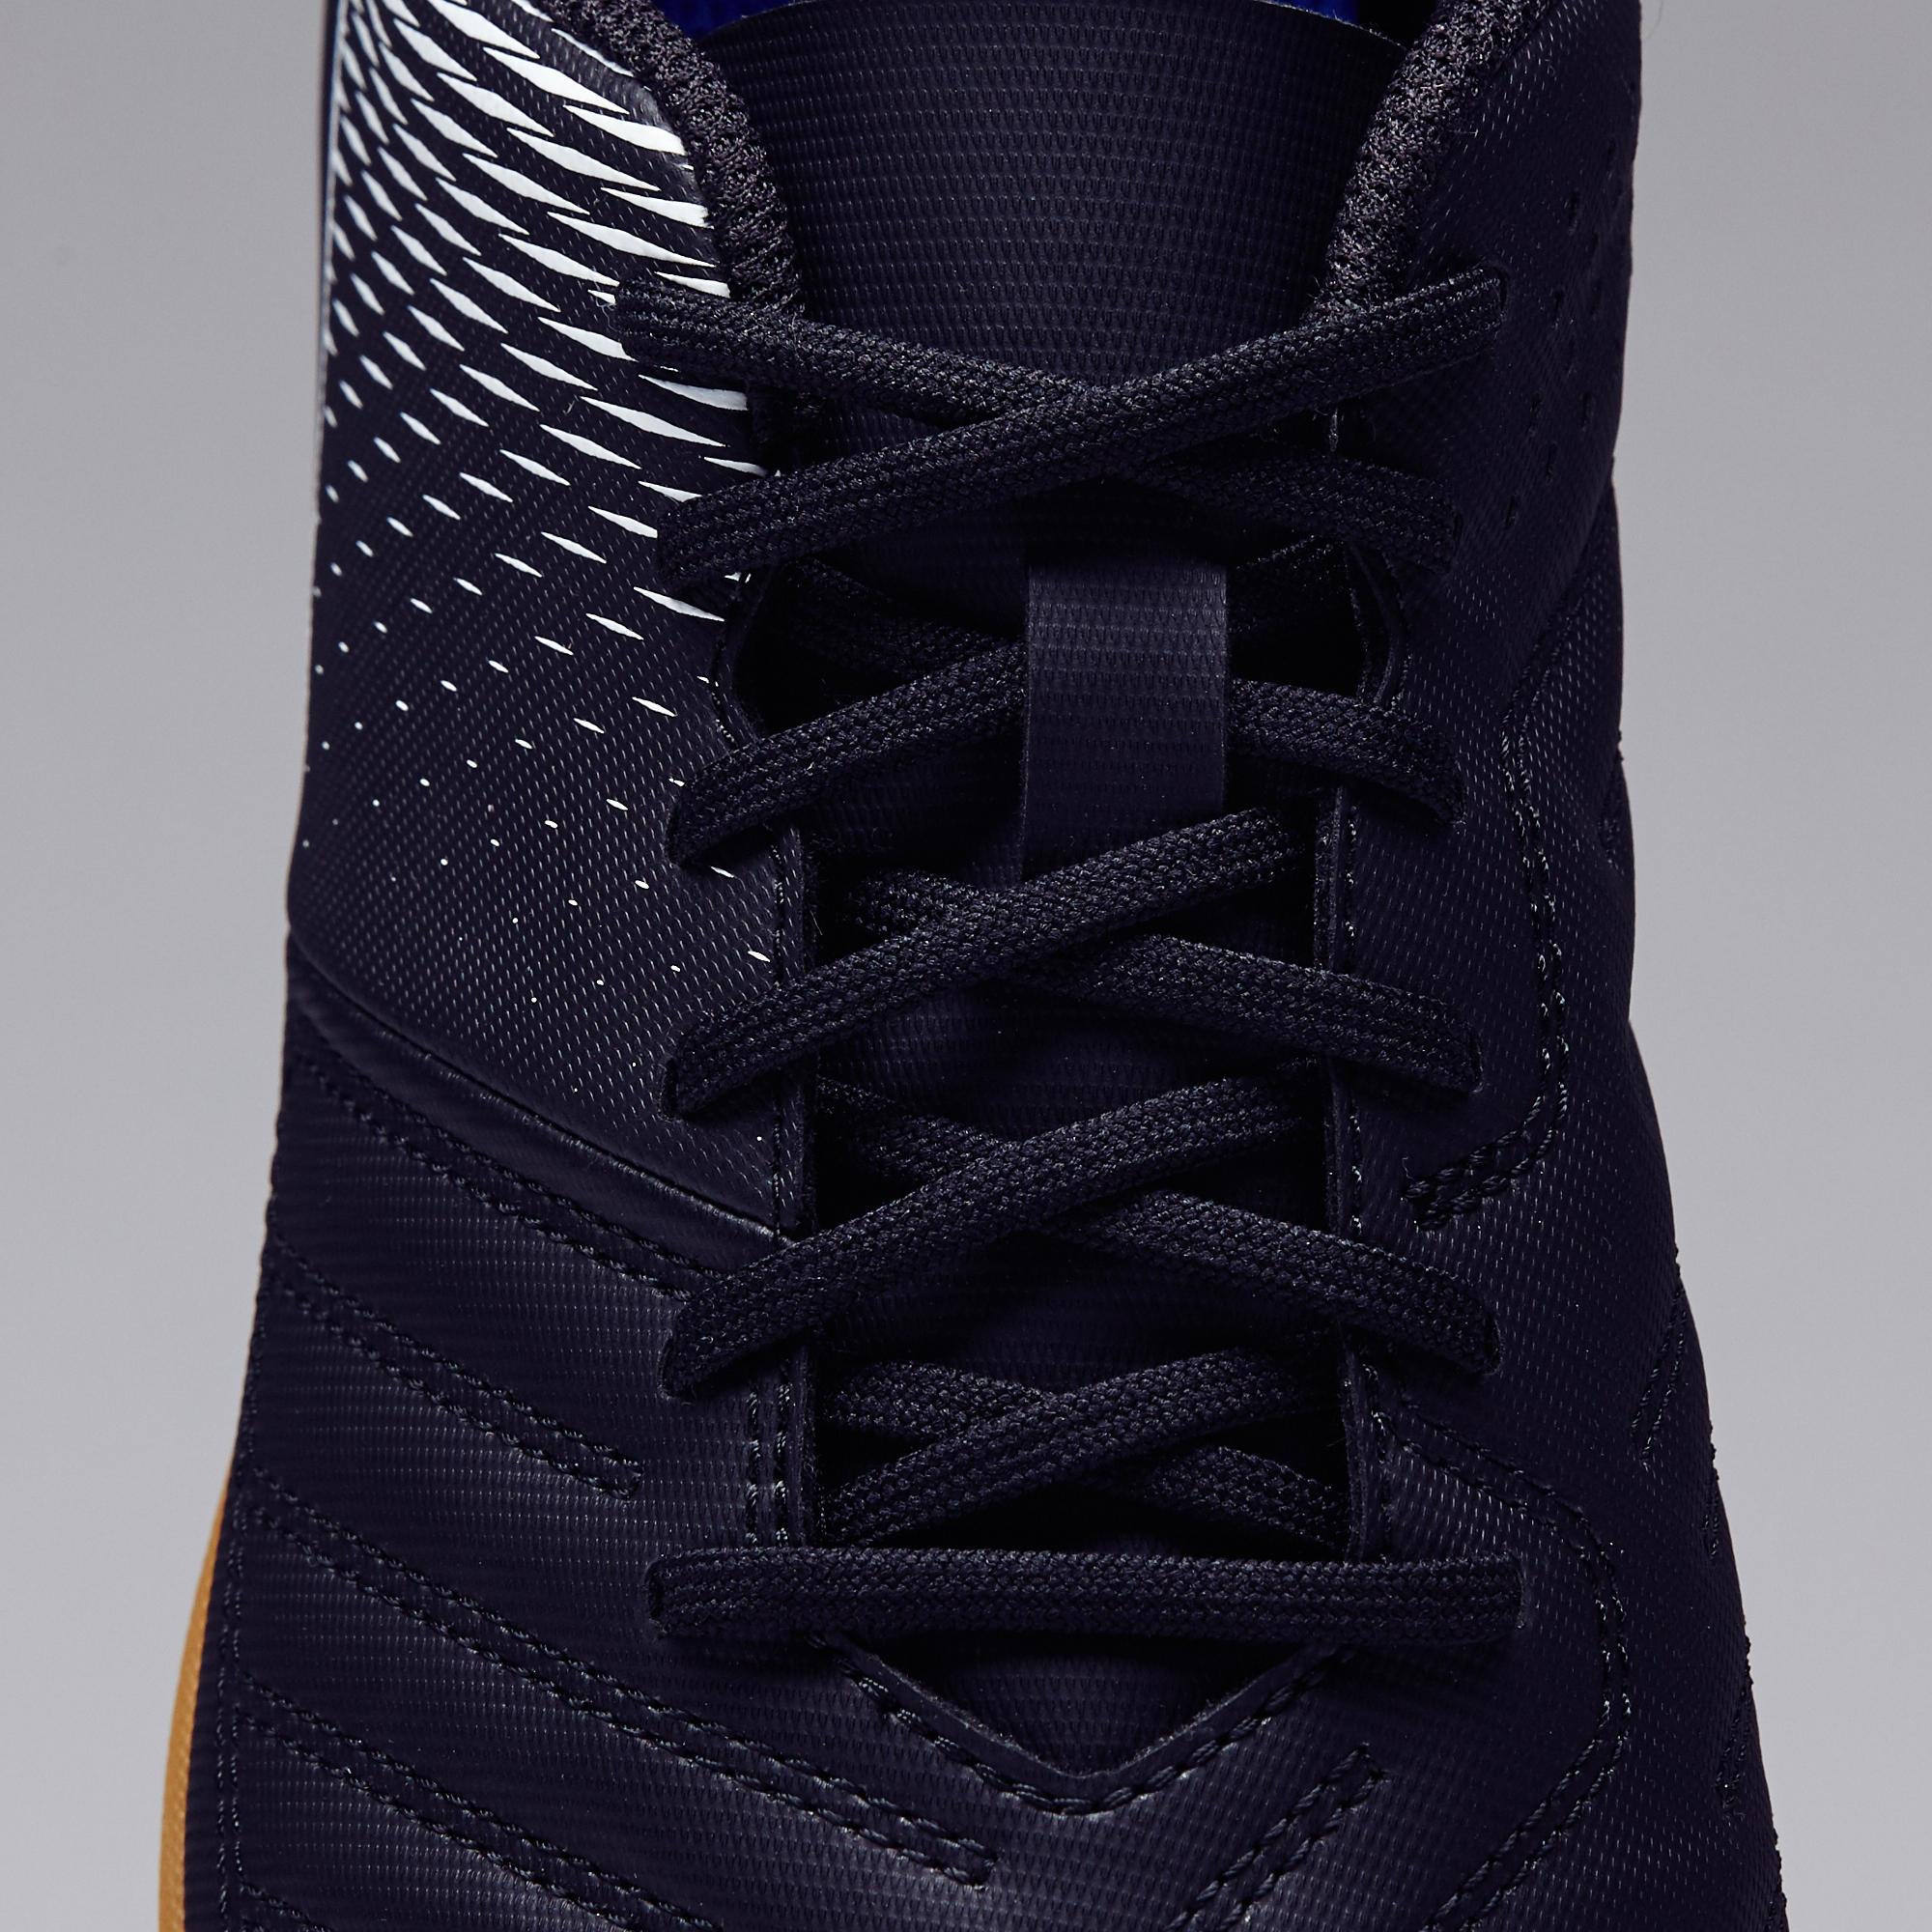 Men's Football Shoes Agility 100 HG - Black/White